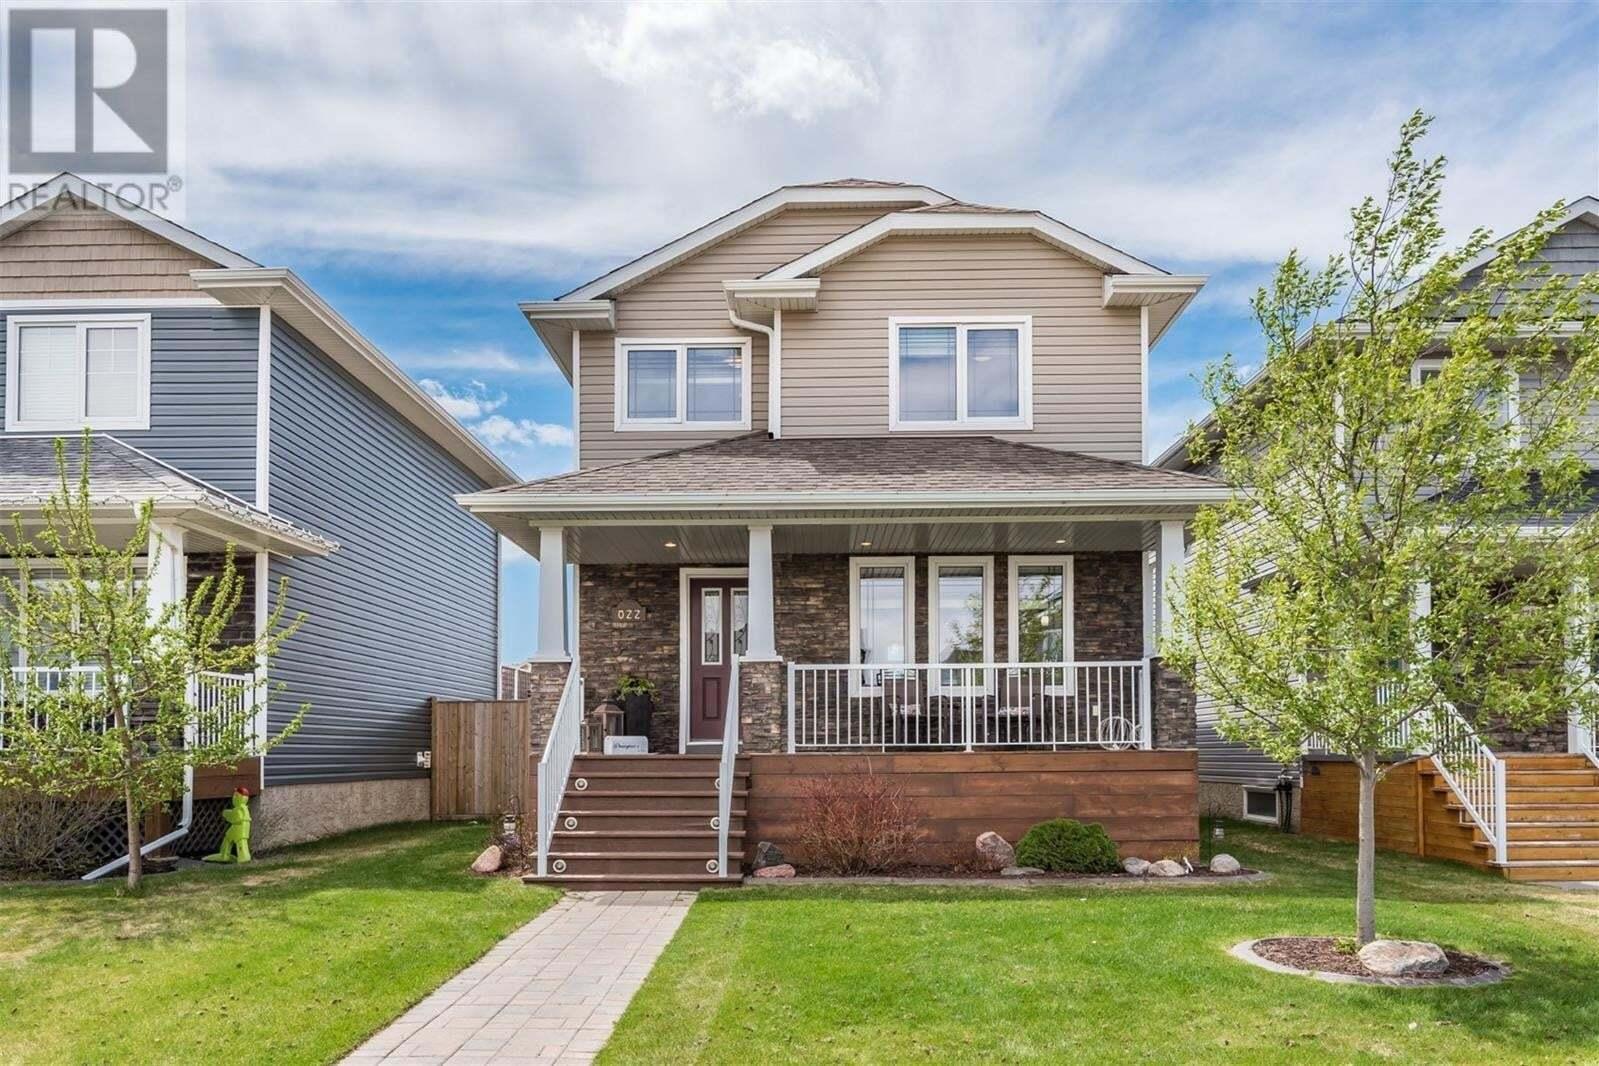 House for sale at 822 Padget Cres Saskatoon Saskatchewan - MLS: SK809486